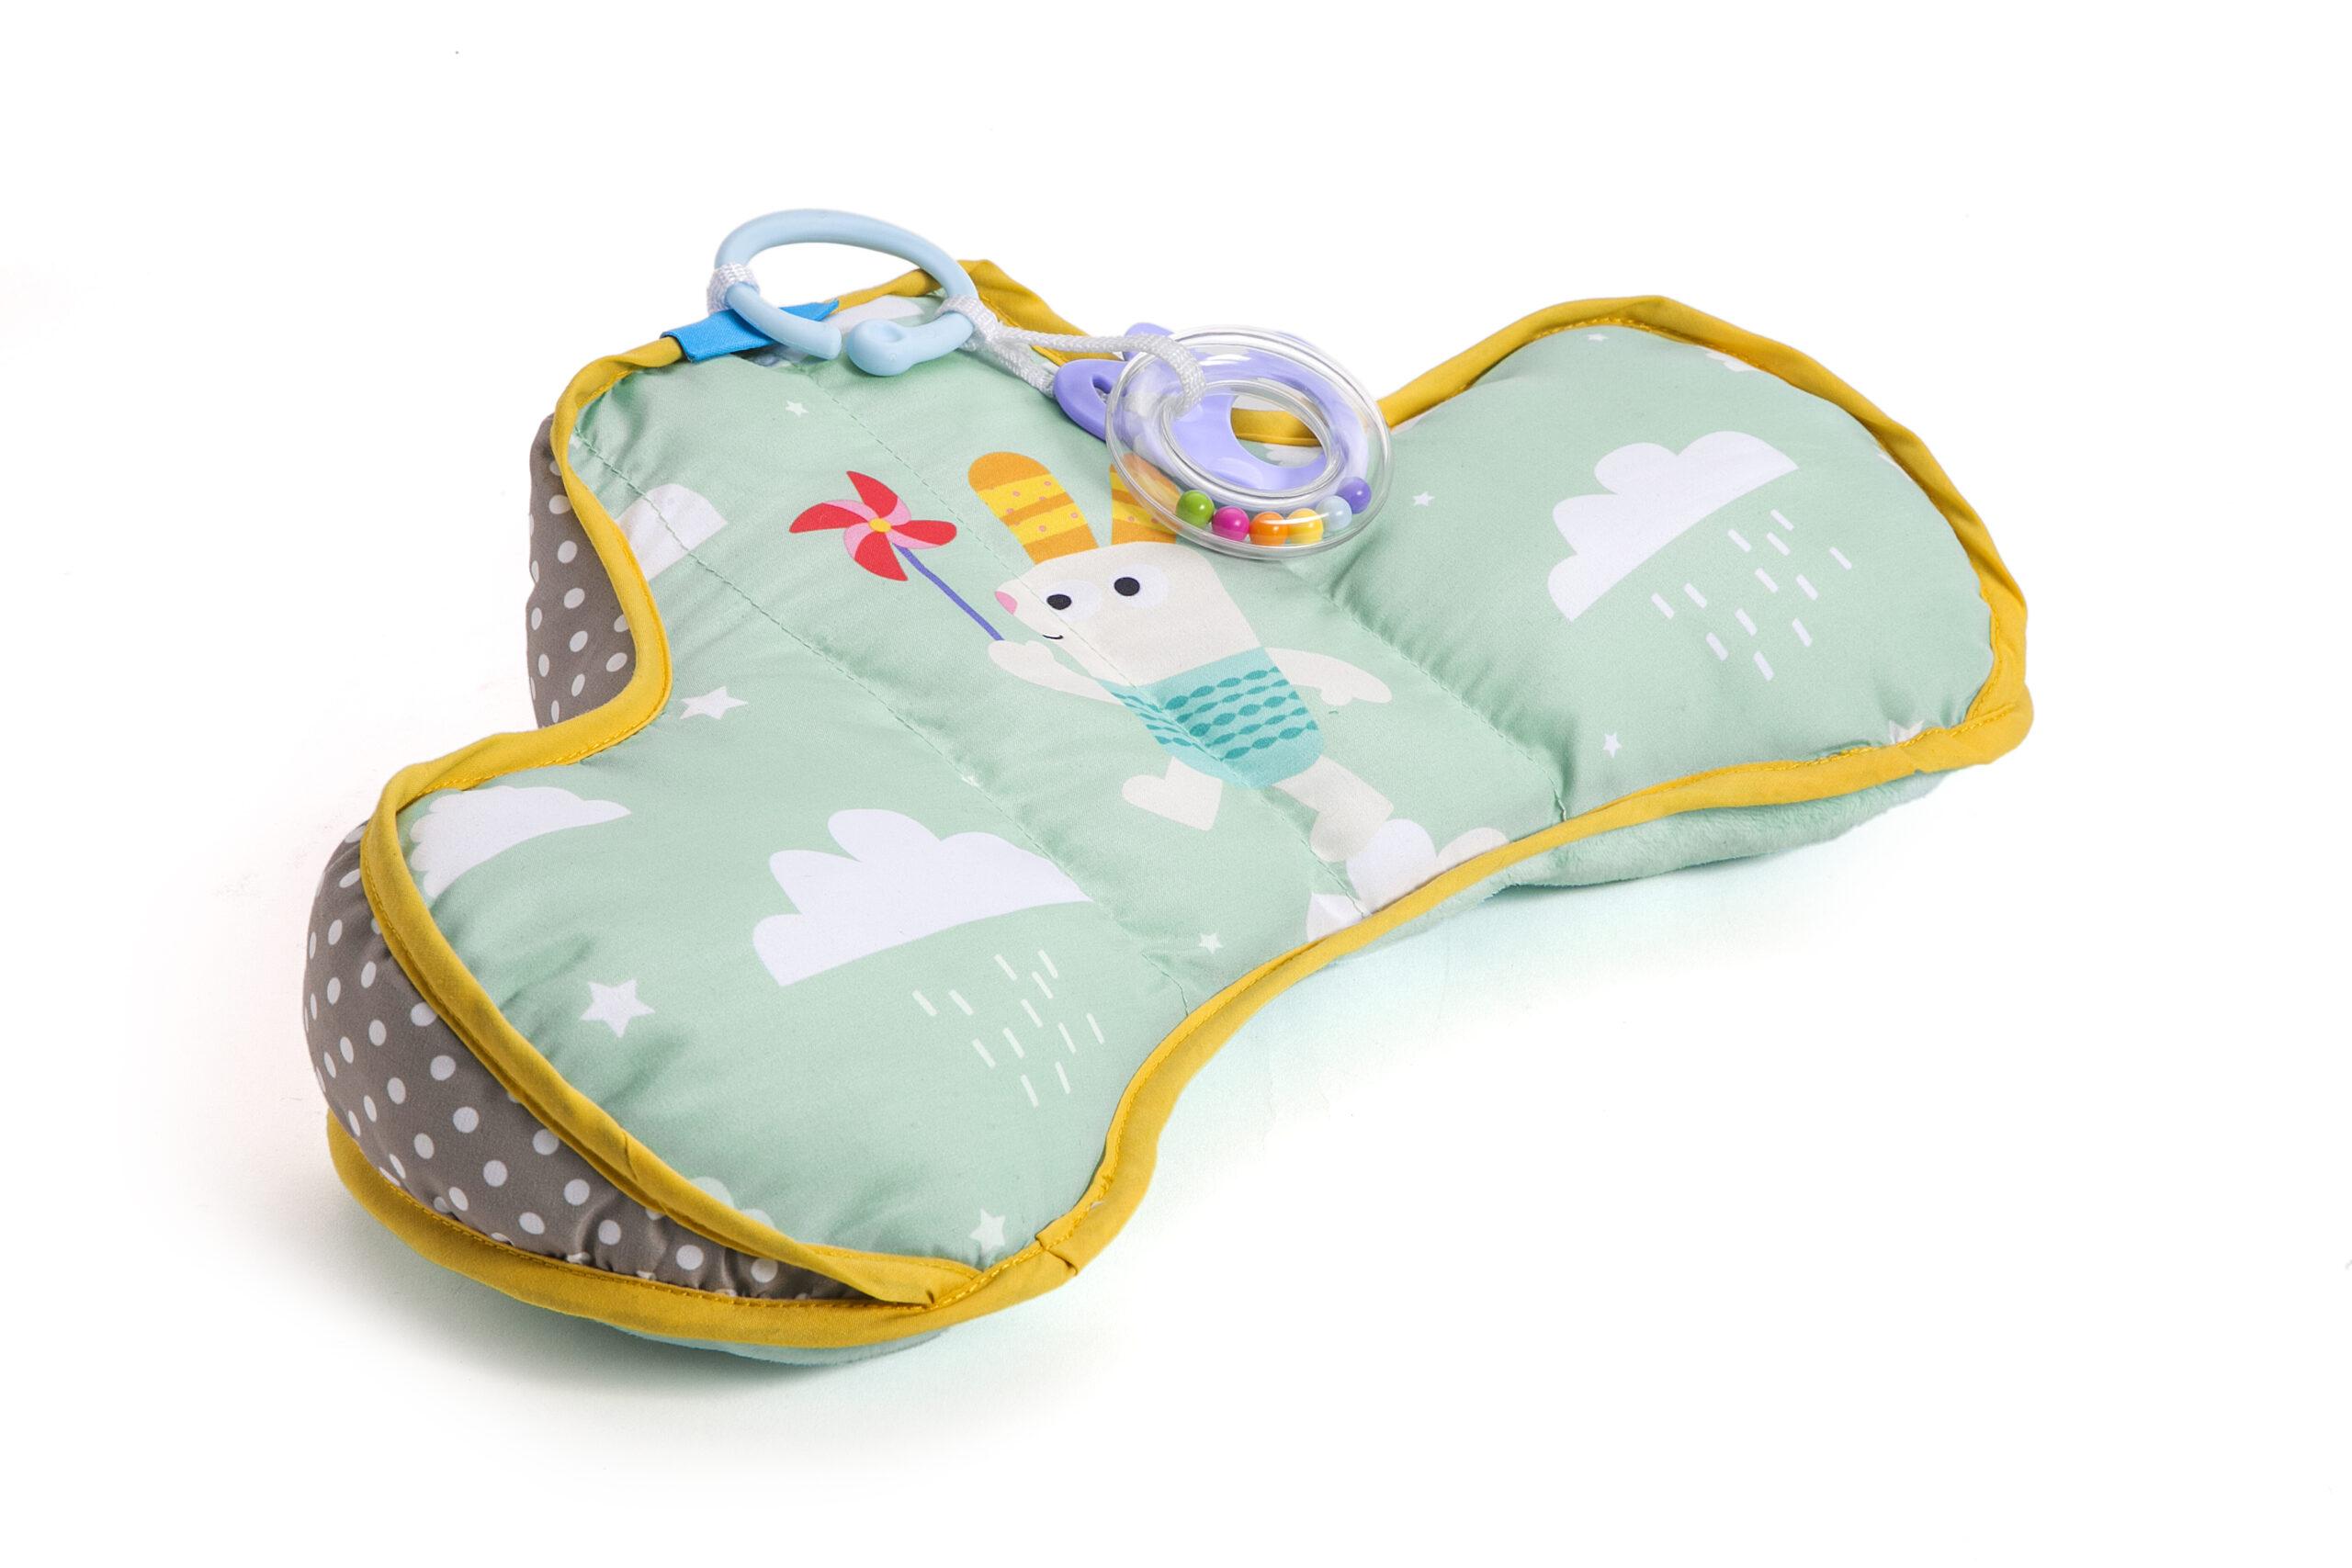 Taf toys developmental pillow T-12045